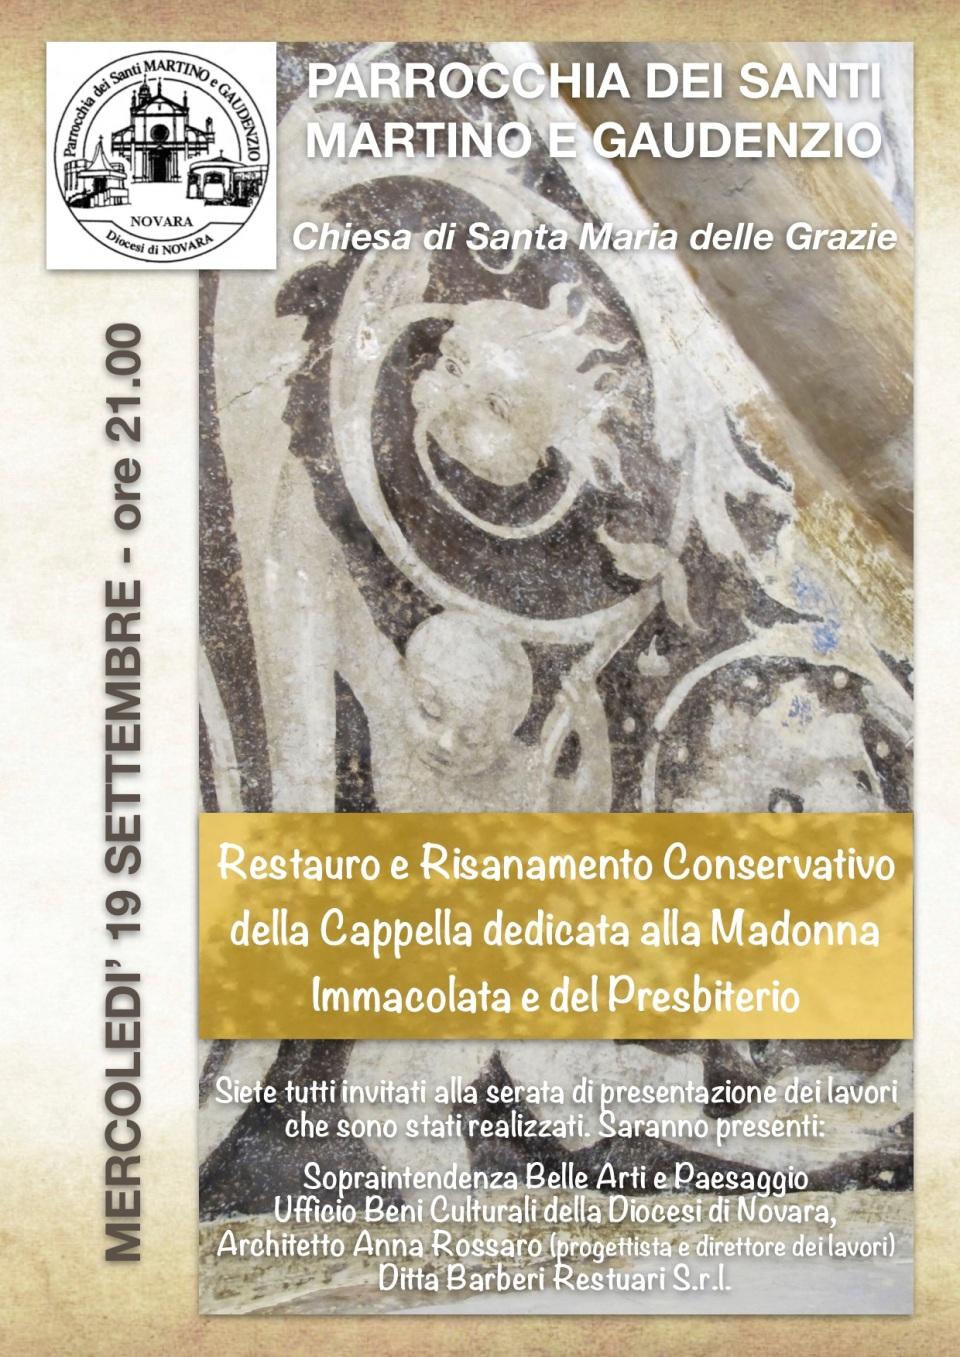 180919 Locandina presentazione restauri Chiesa Parrocchiale